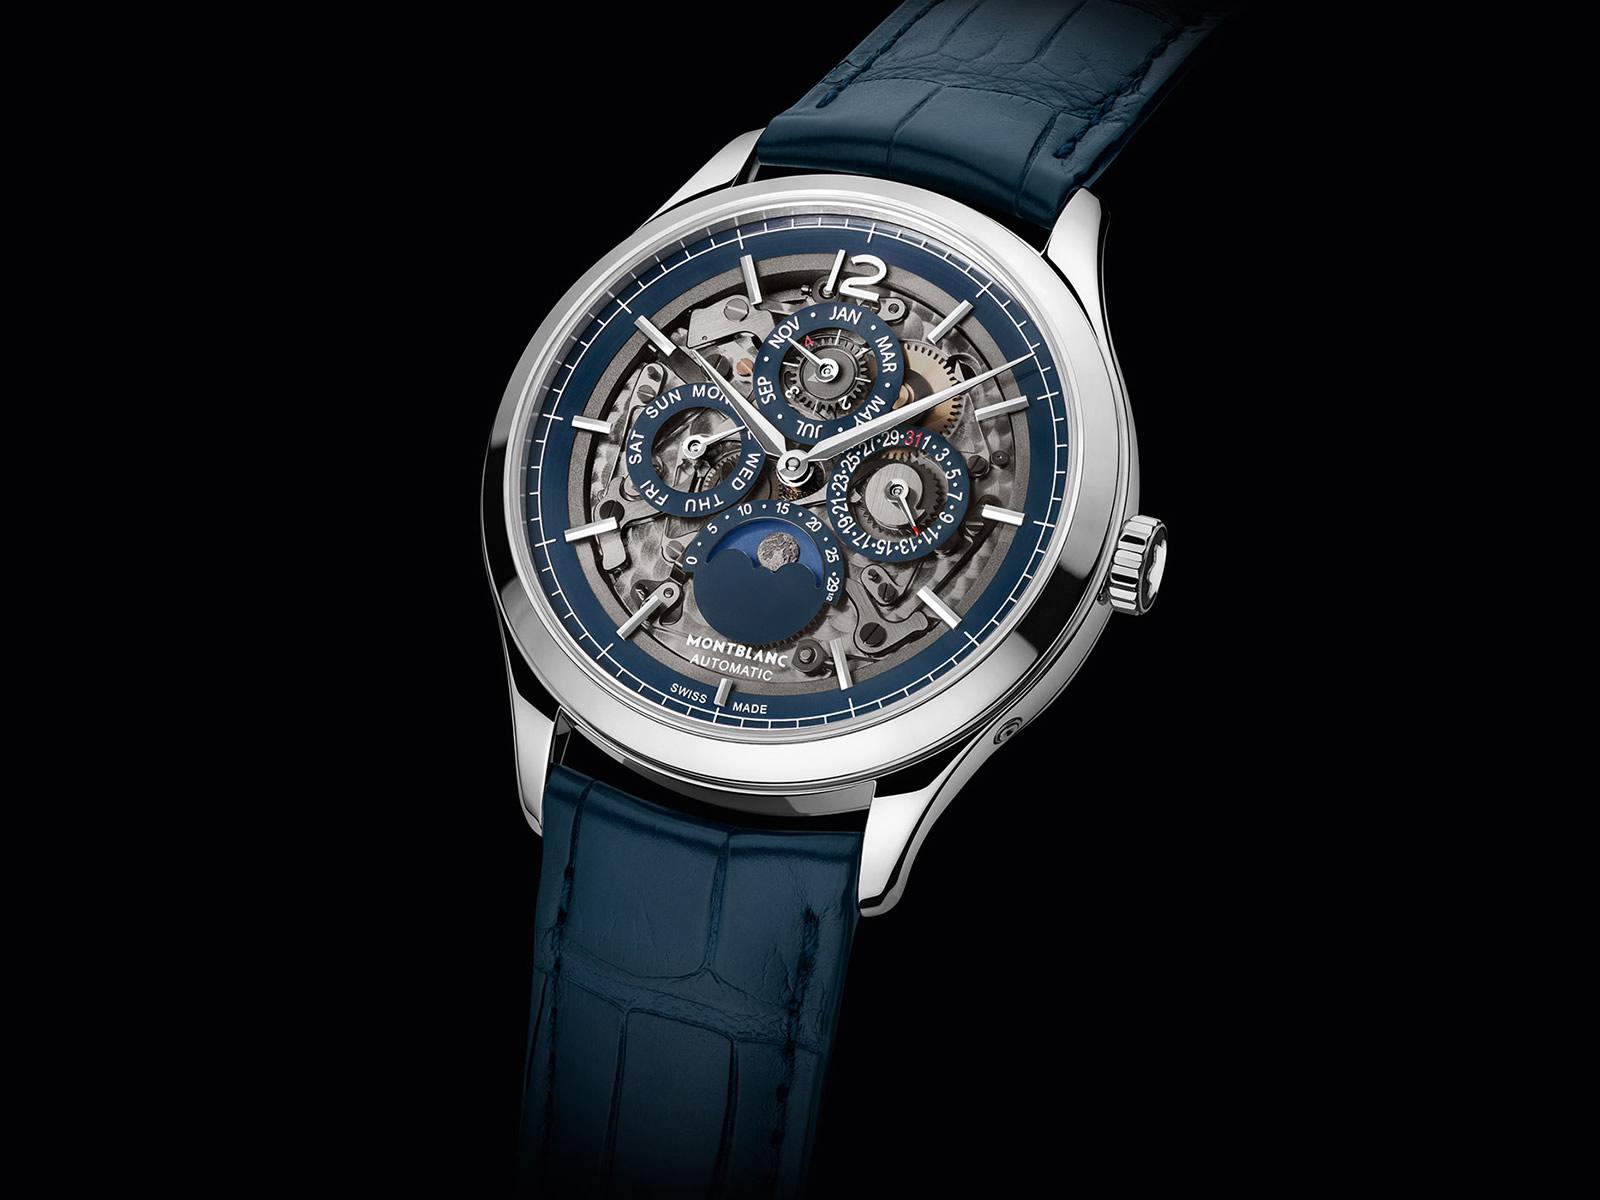 118513-montblanc-heritage-chronometrie-perpetual-calendar-sapphire-2-.jpg